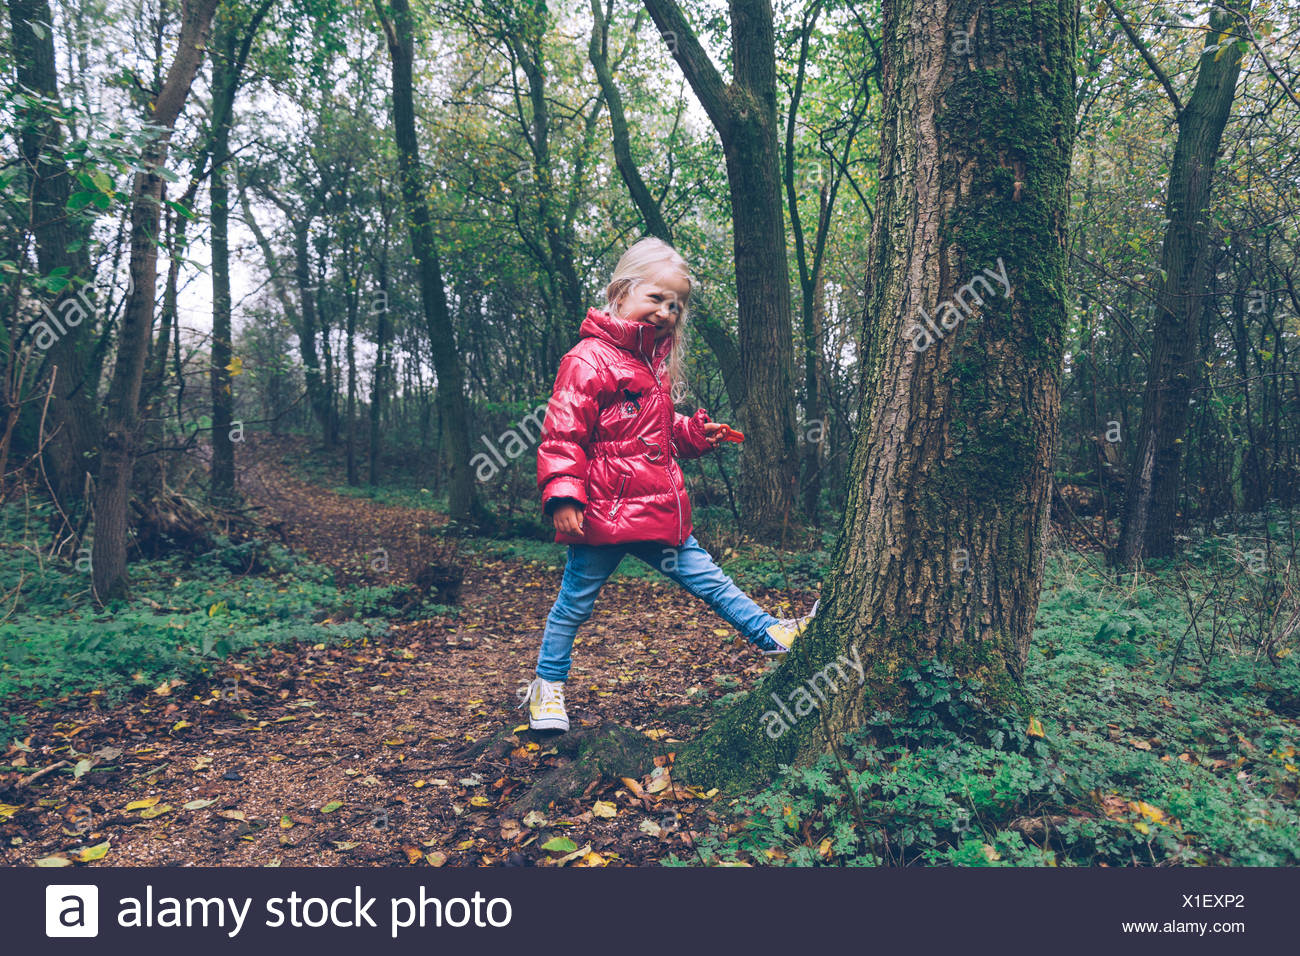 Mädchen in den Wald, Ritthem, Zeeland, Holland Flickschusterei Stockfoto